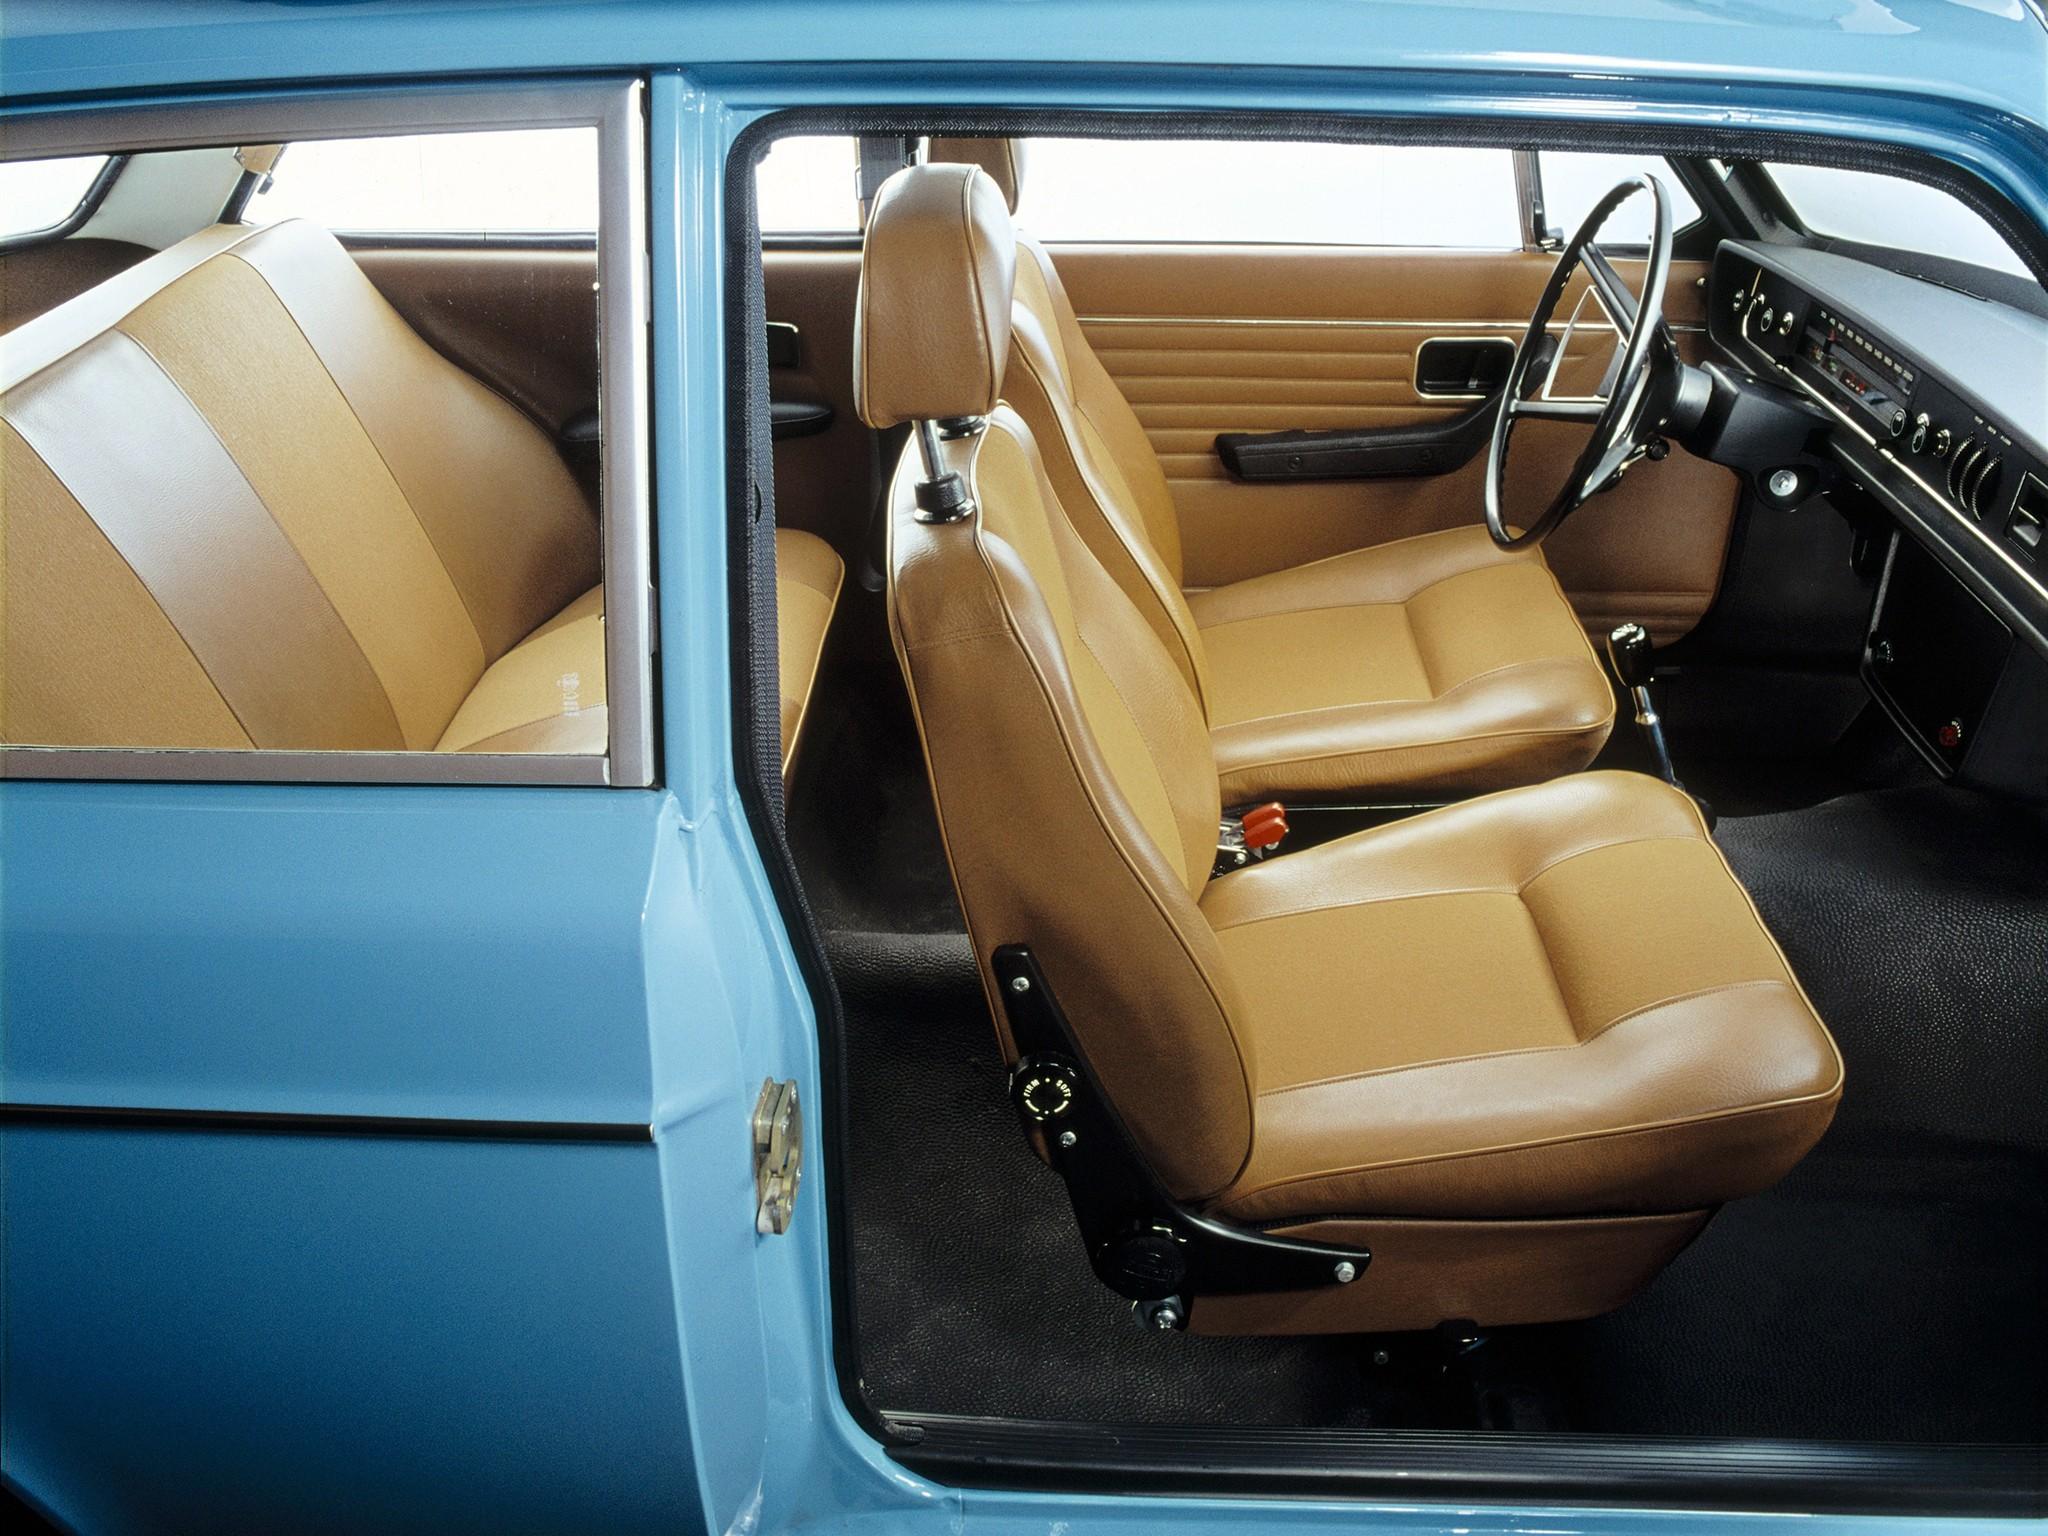 Volvo Suv Used >> VOLVO 142 specs & photos - 1967, 1968, 1969, 1970, 1971 ...